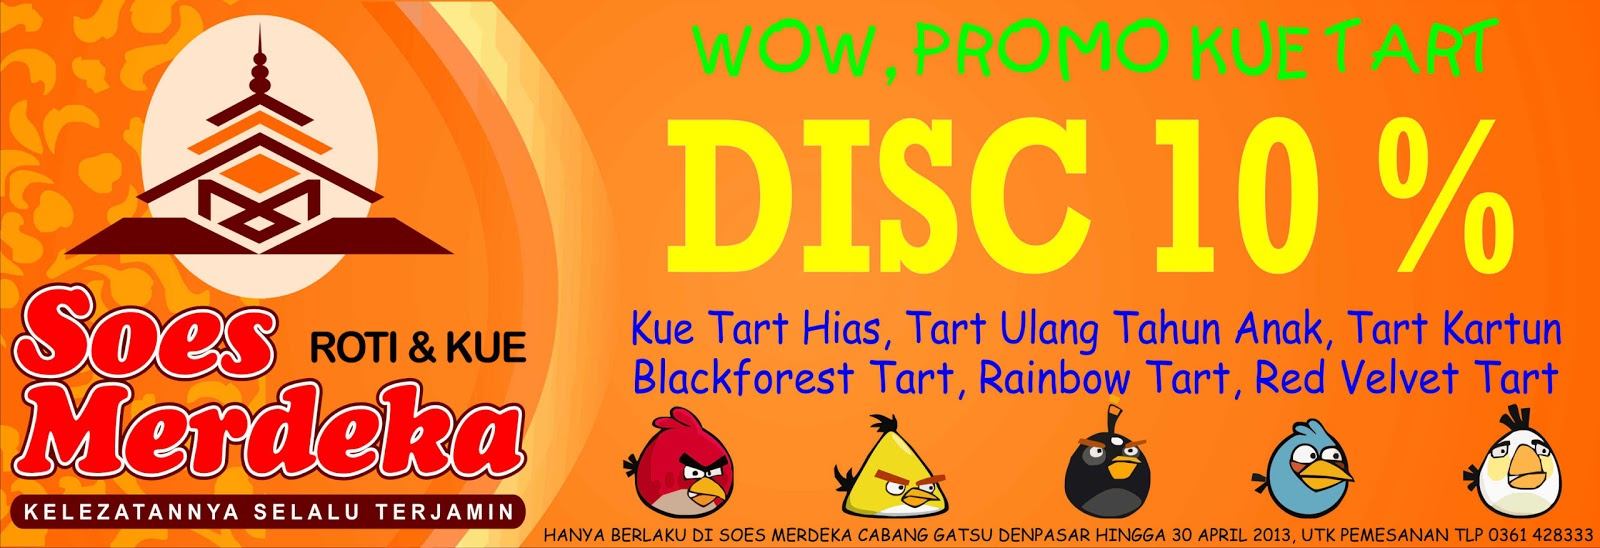 Promo Kue Tart Ulang Tahun Di Soes Merdeka Gatot Subroto Denpasar Bali